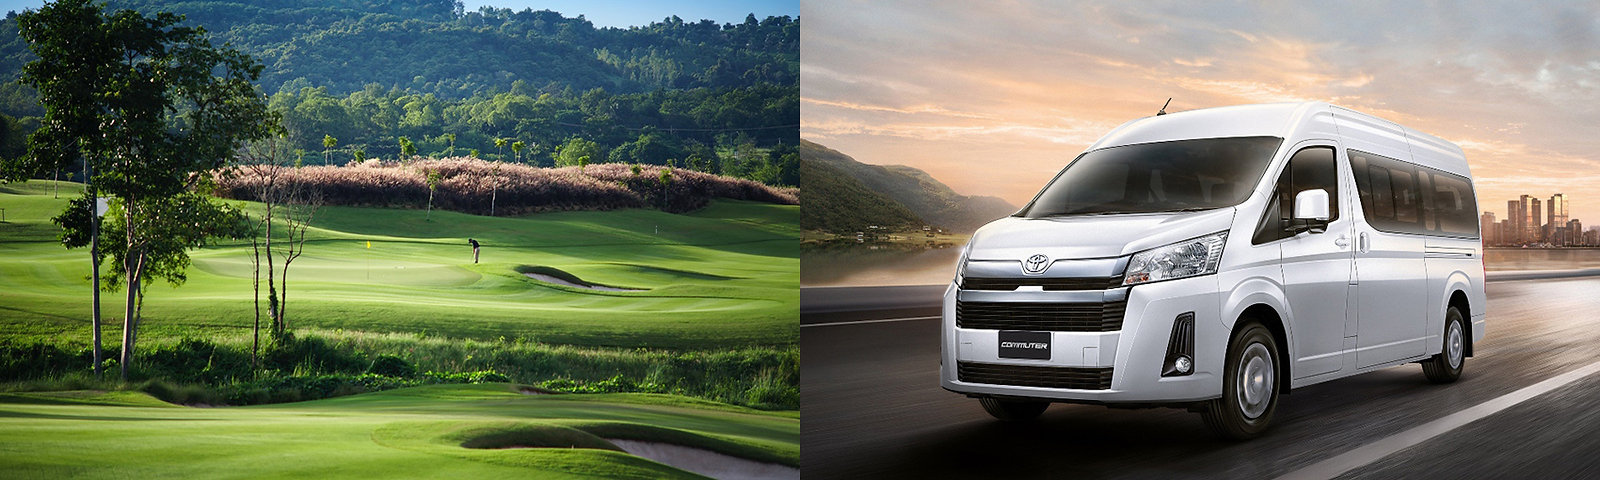 Golf&Car_JPG.jpg